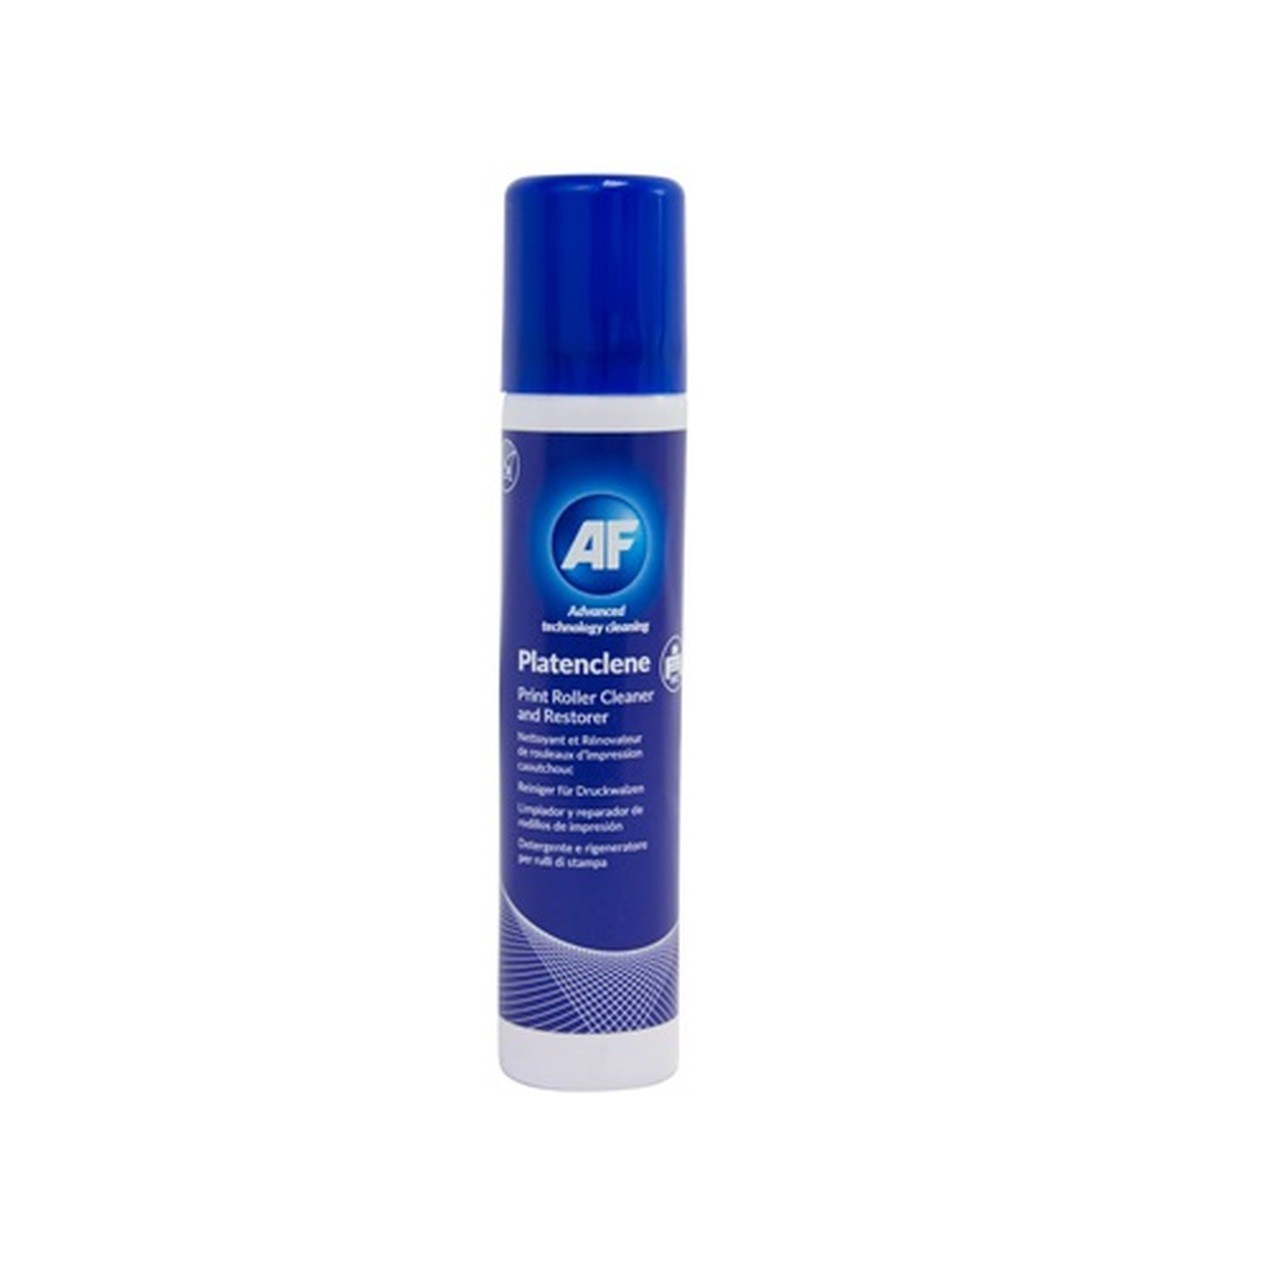 AF Platenclene Rubber Cleaner - APCL100